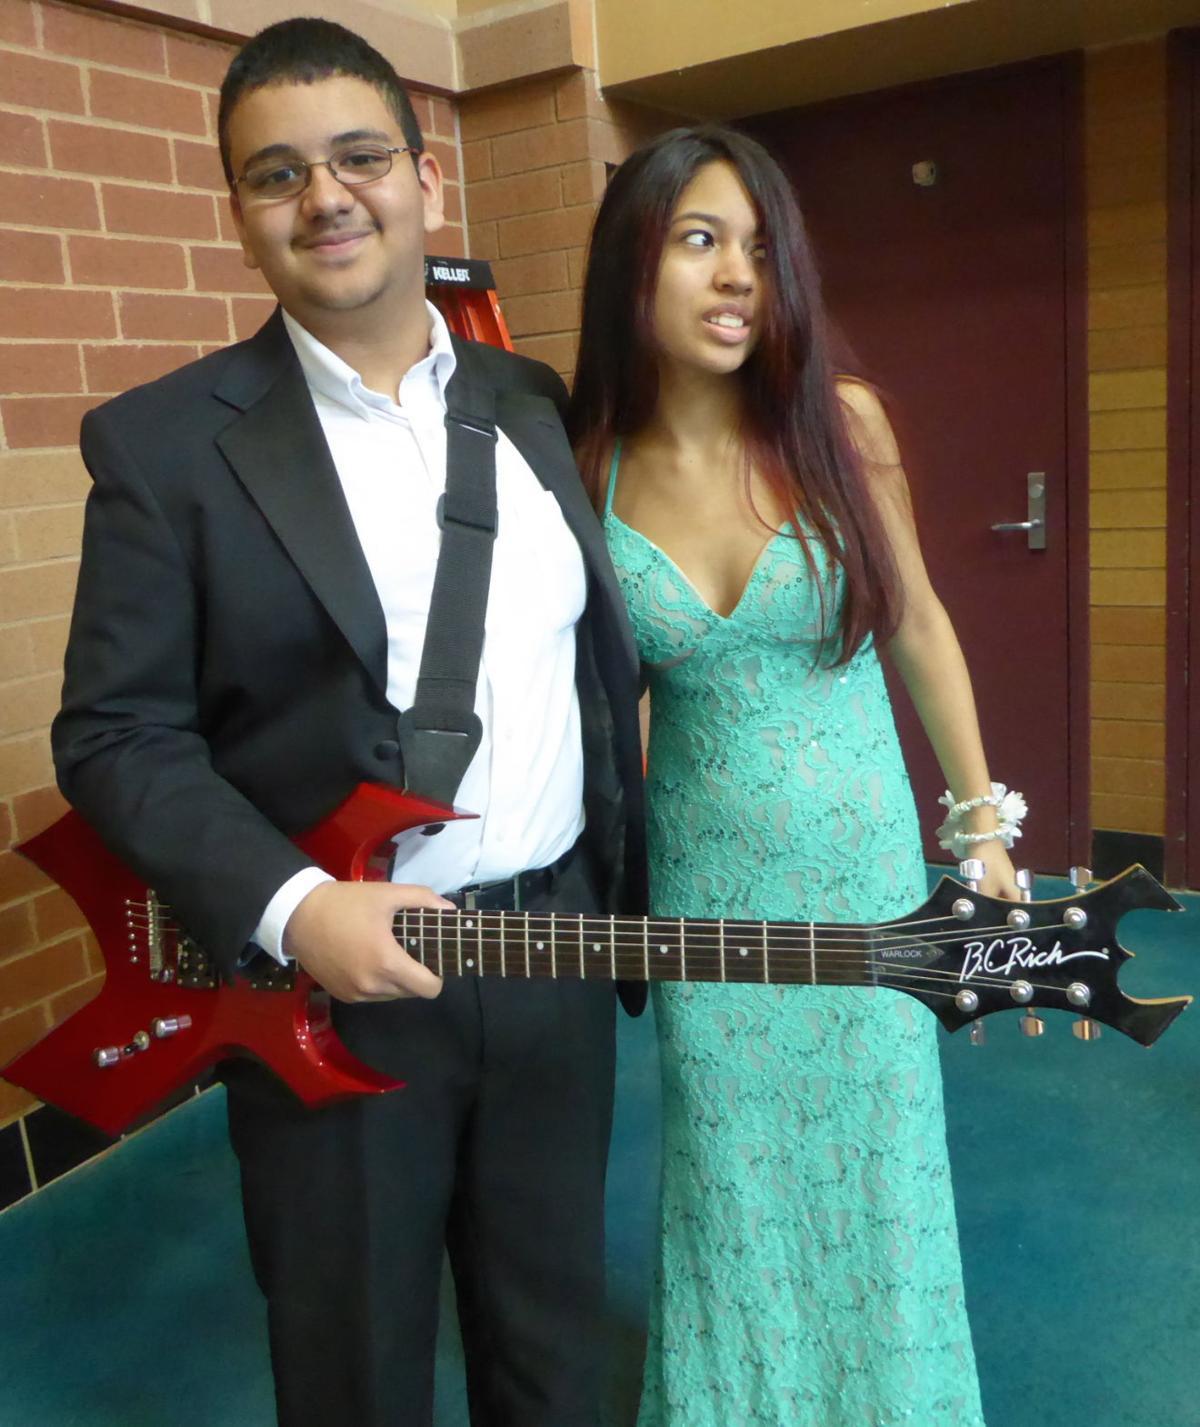 Great Girl Prom Tuxedo Images - Wedding Ideas - memiocall.com